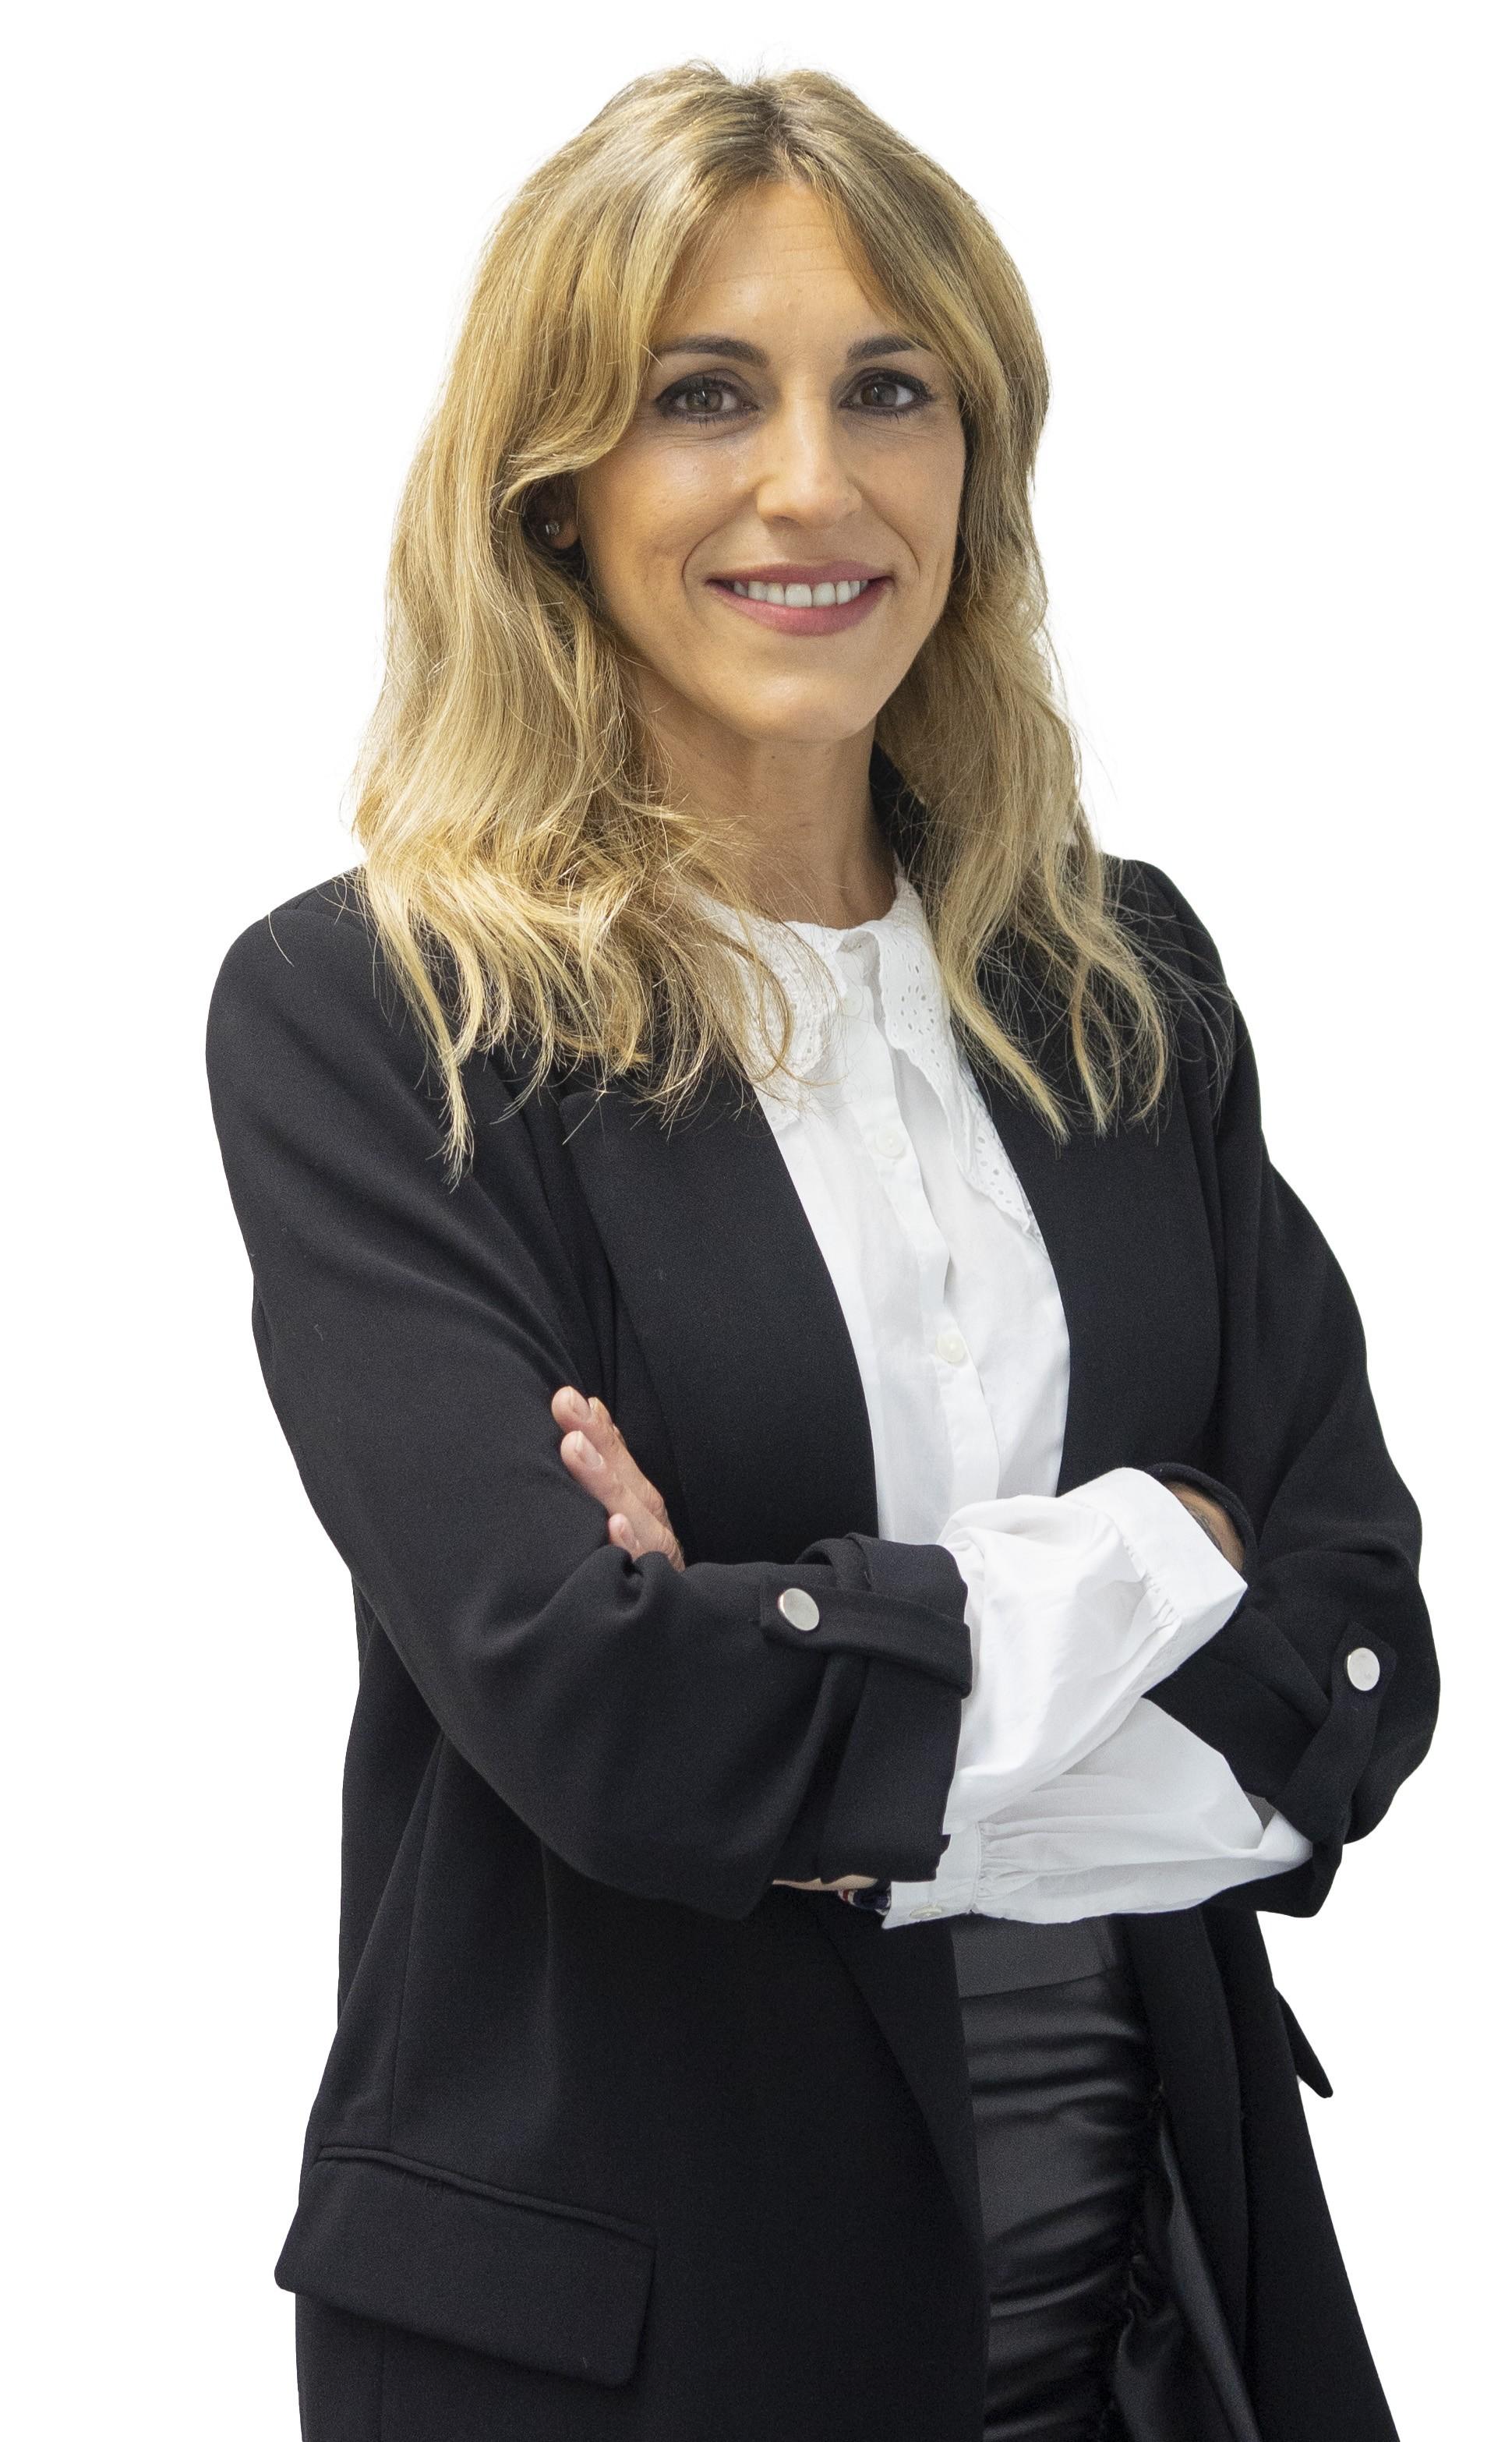 Noelia Navas Fernandez